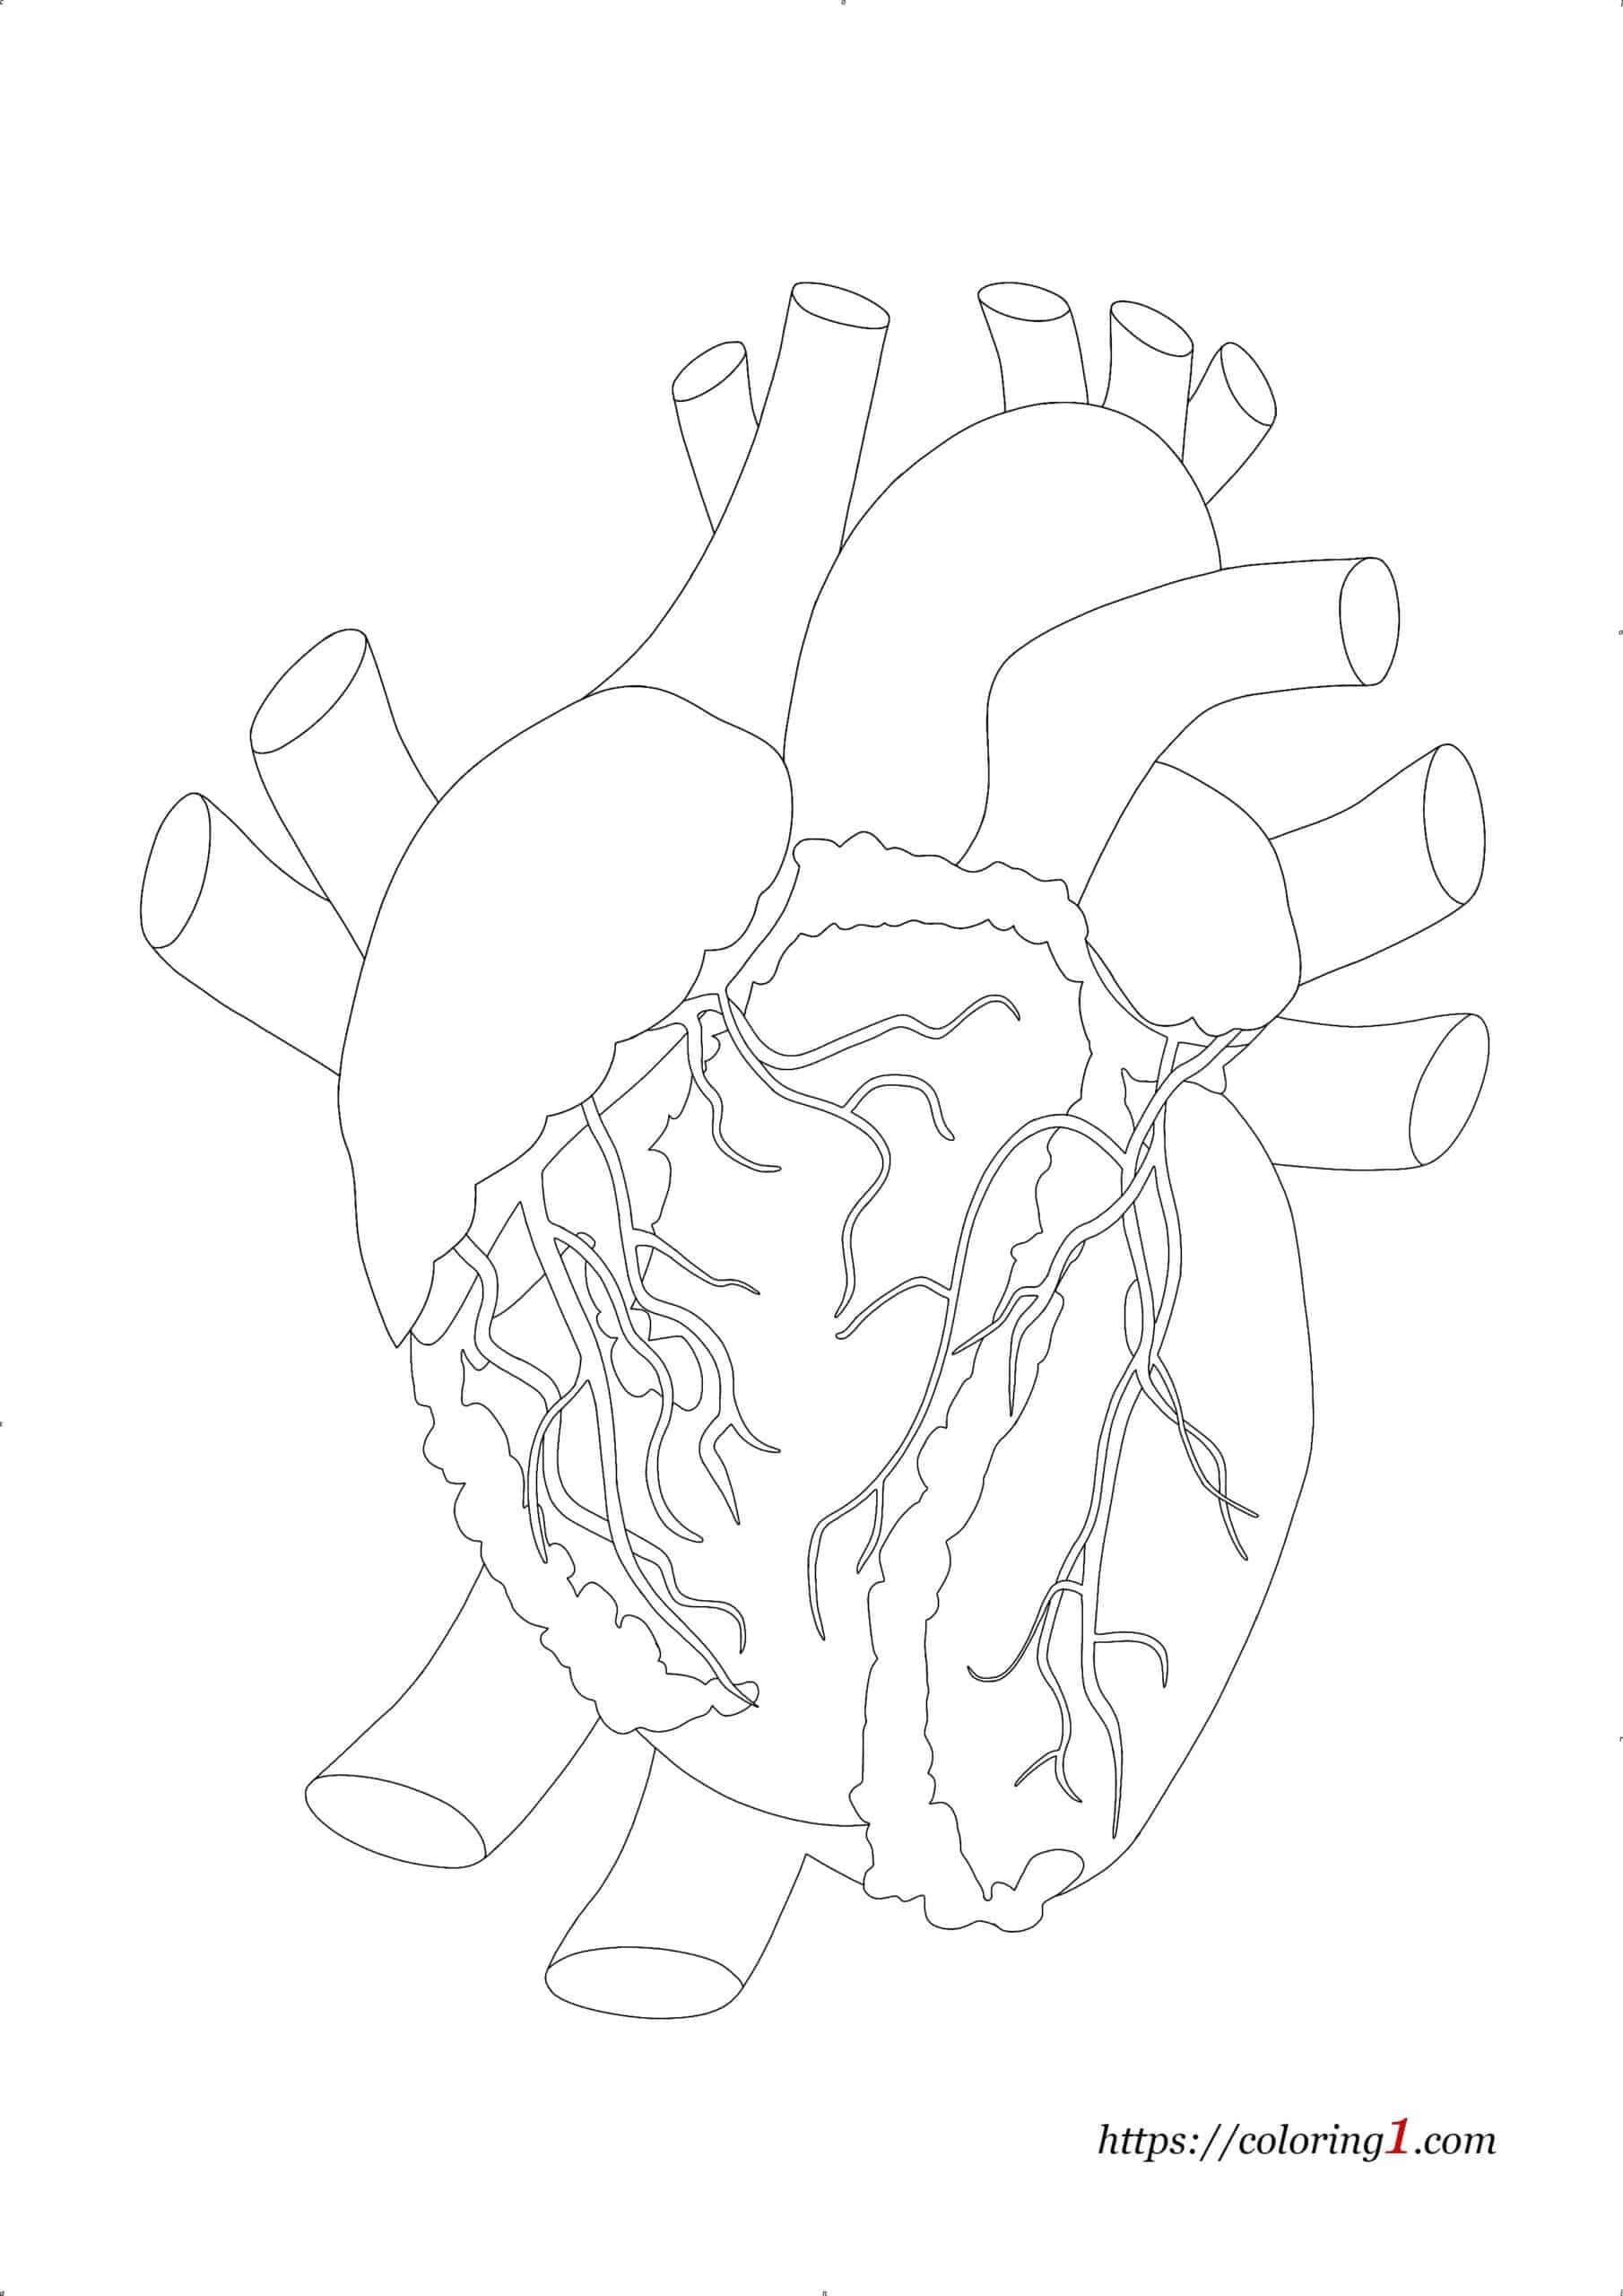 Real Human Anatomical Heart coloring page